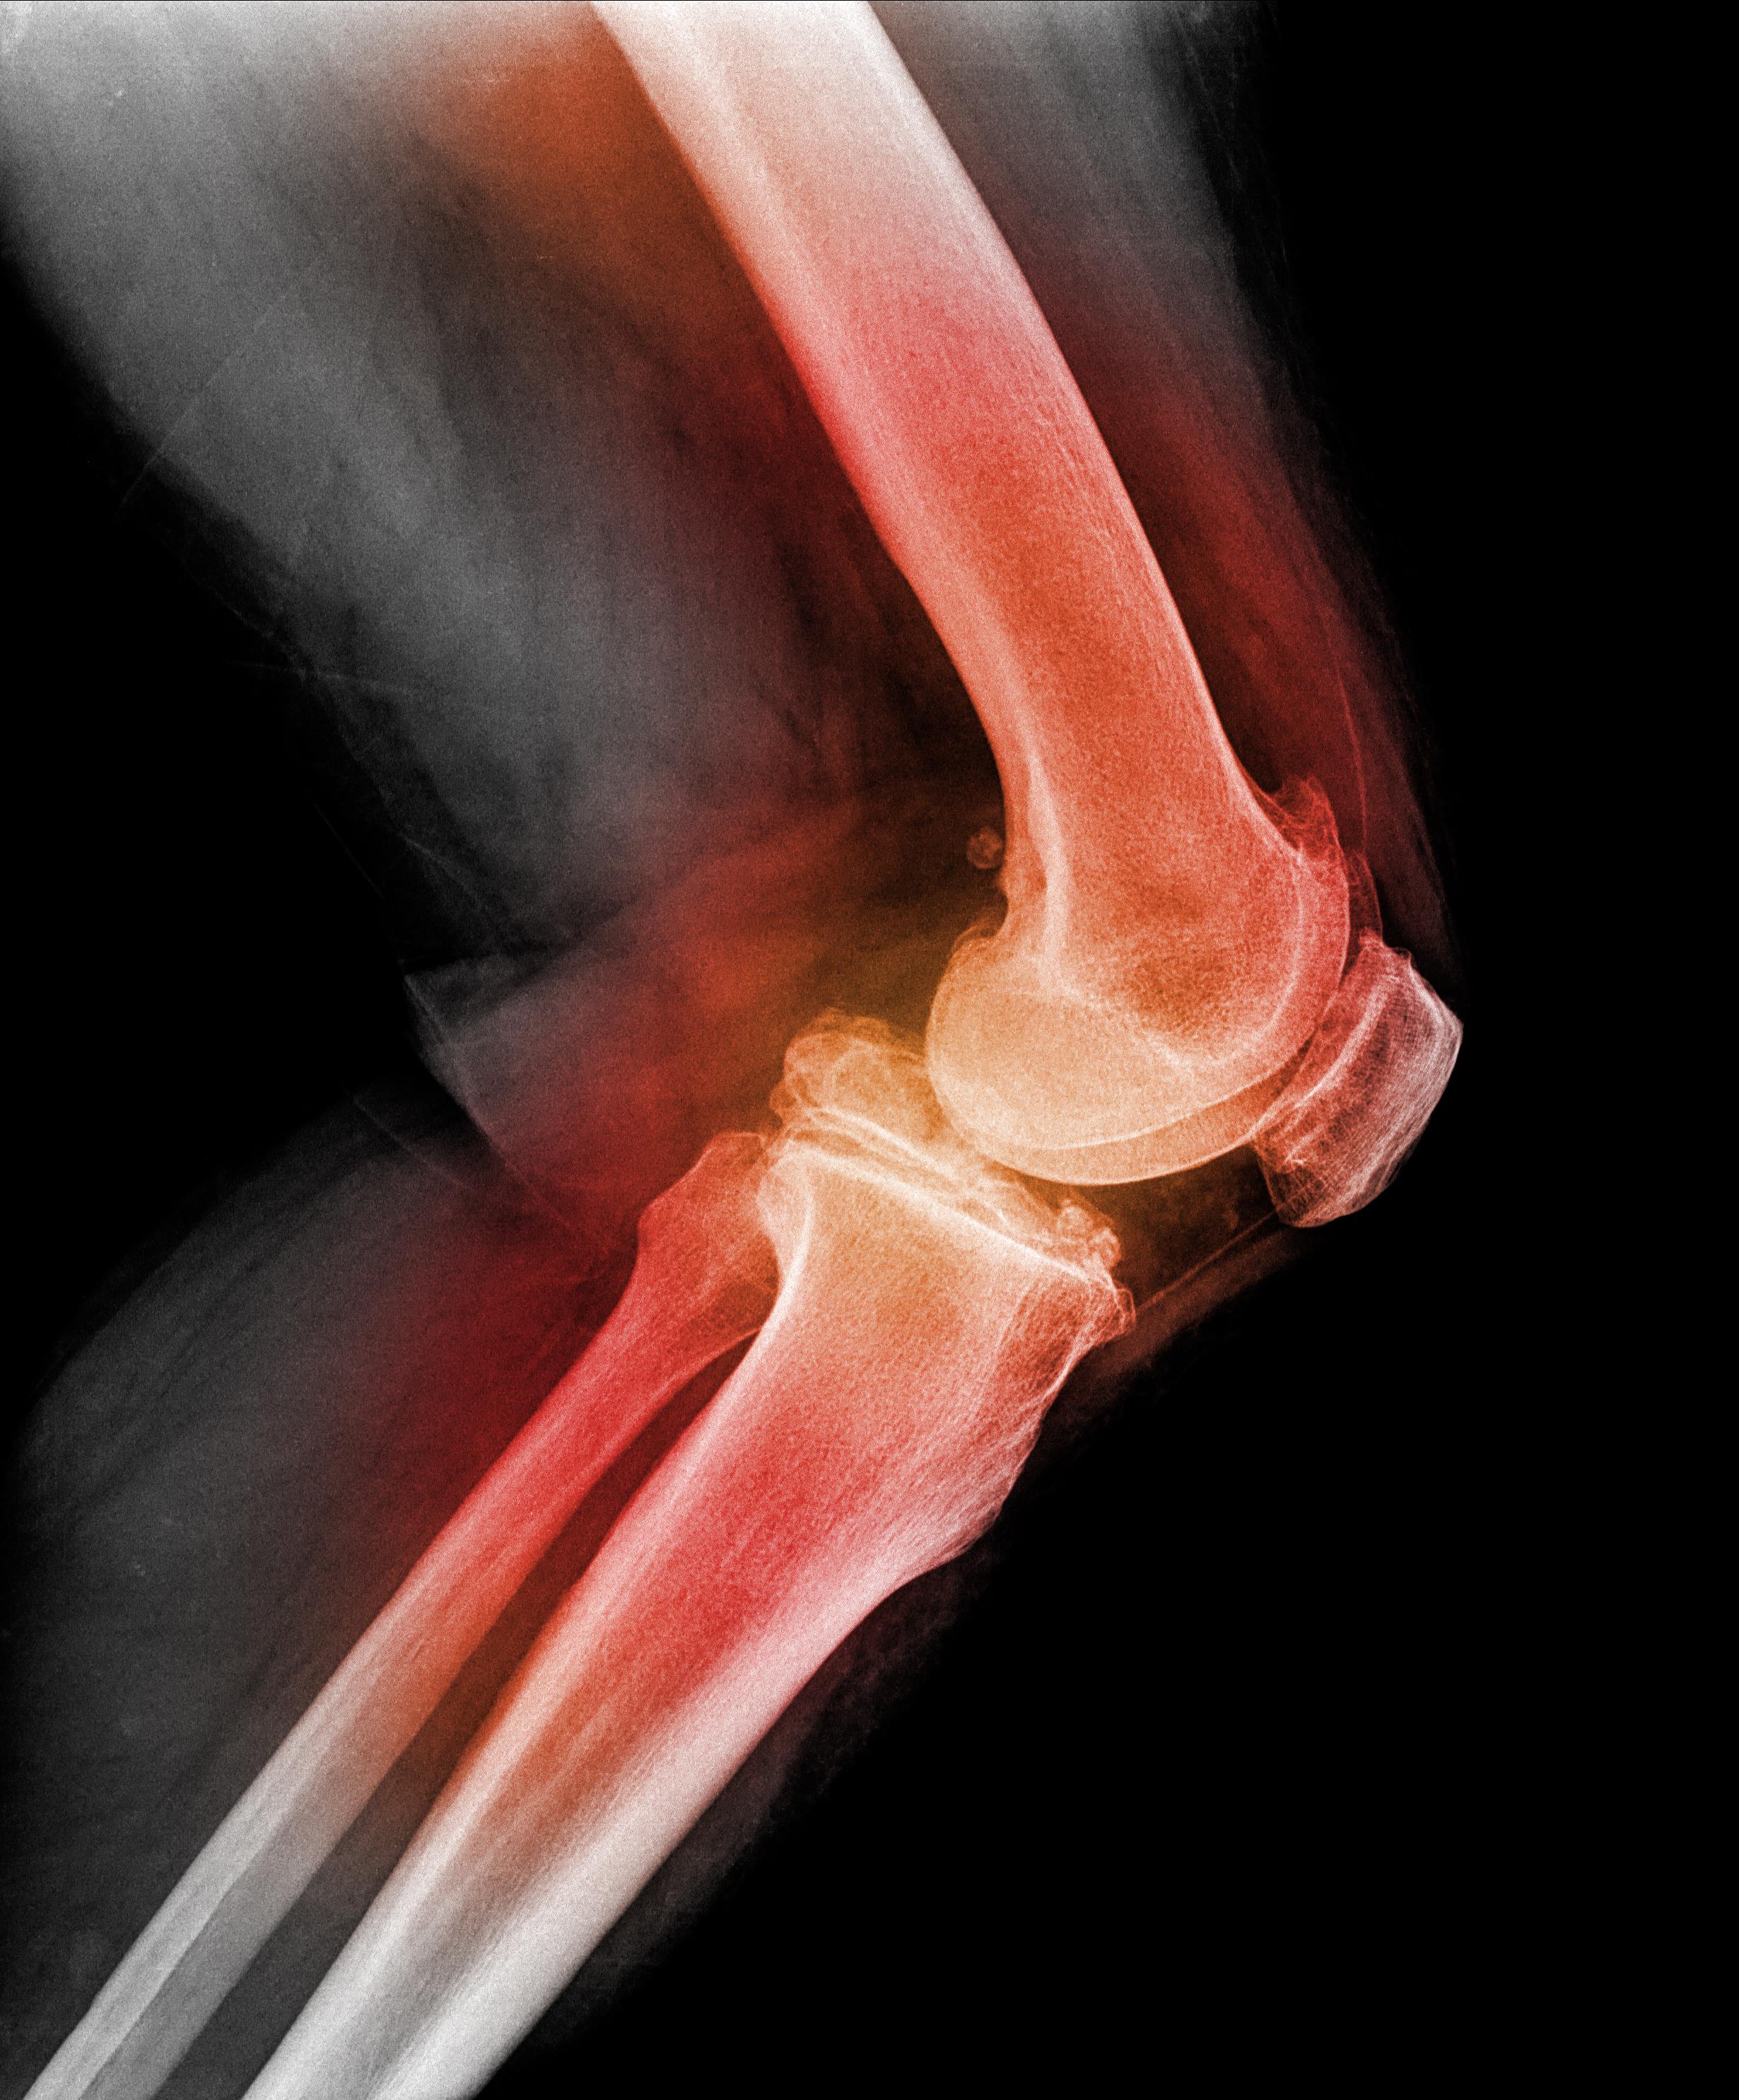 fonoforeza pentru artrita genunchiului clinica de tratament a durerii articulare